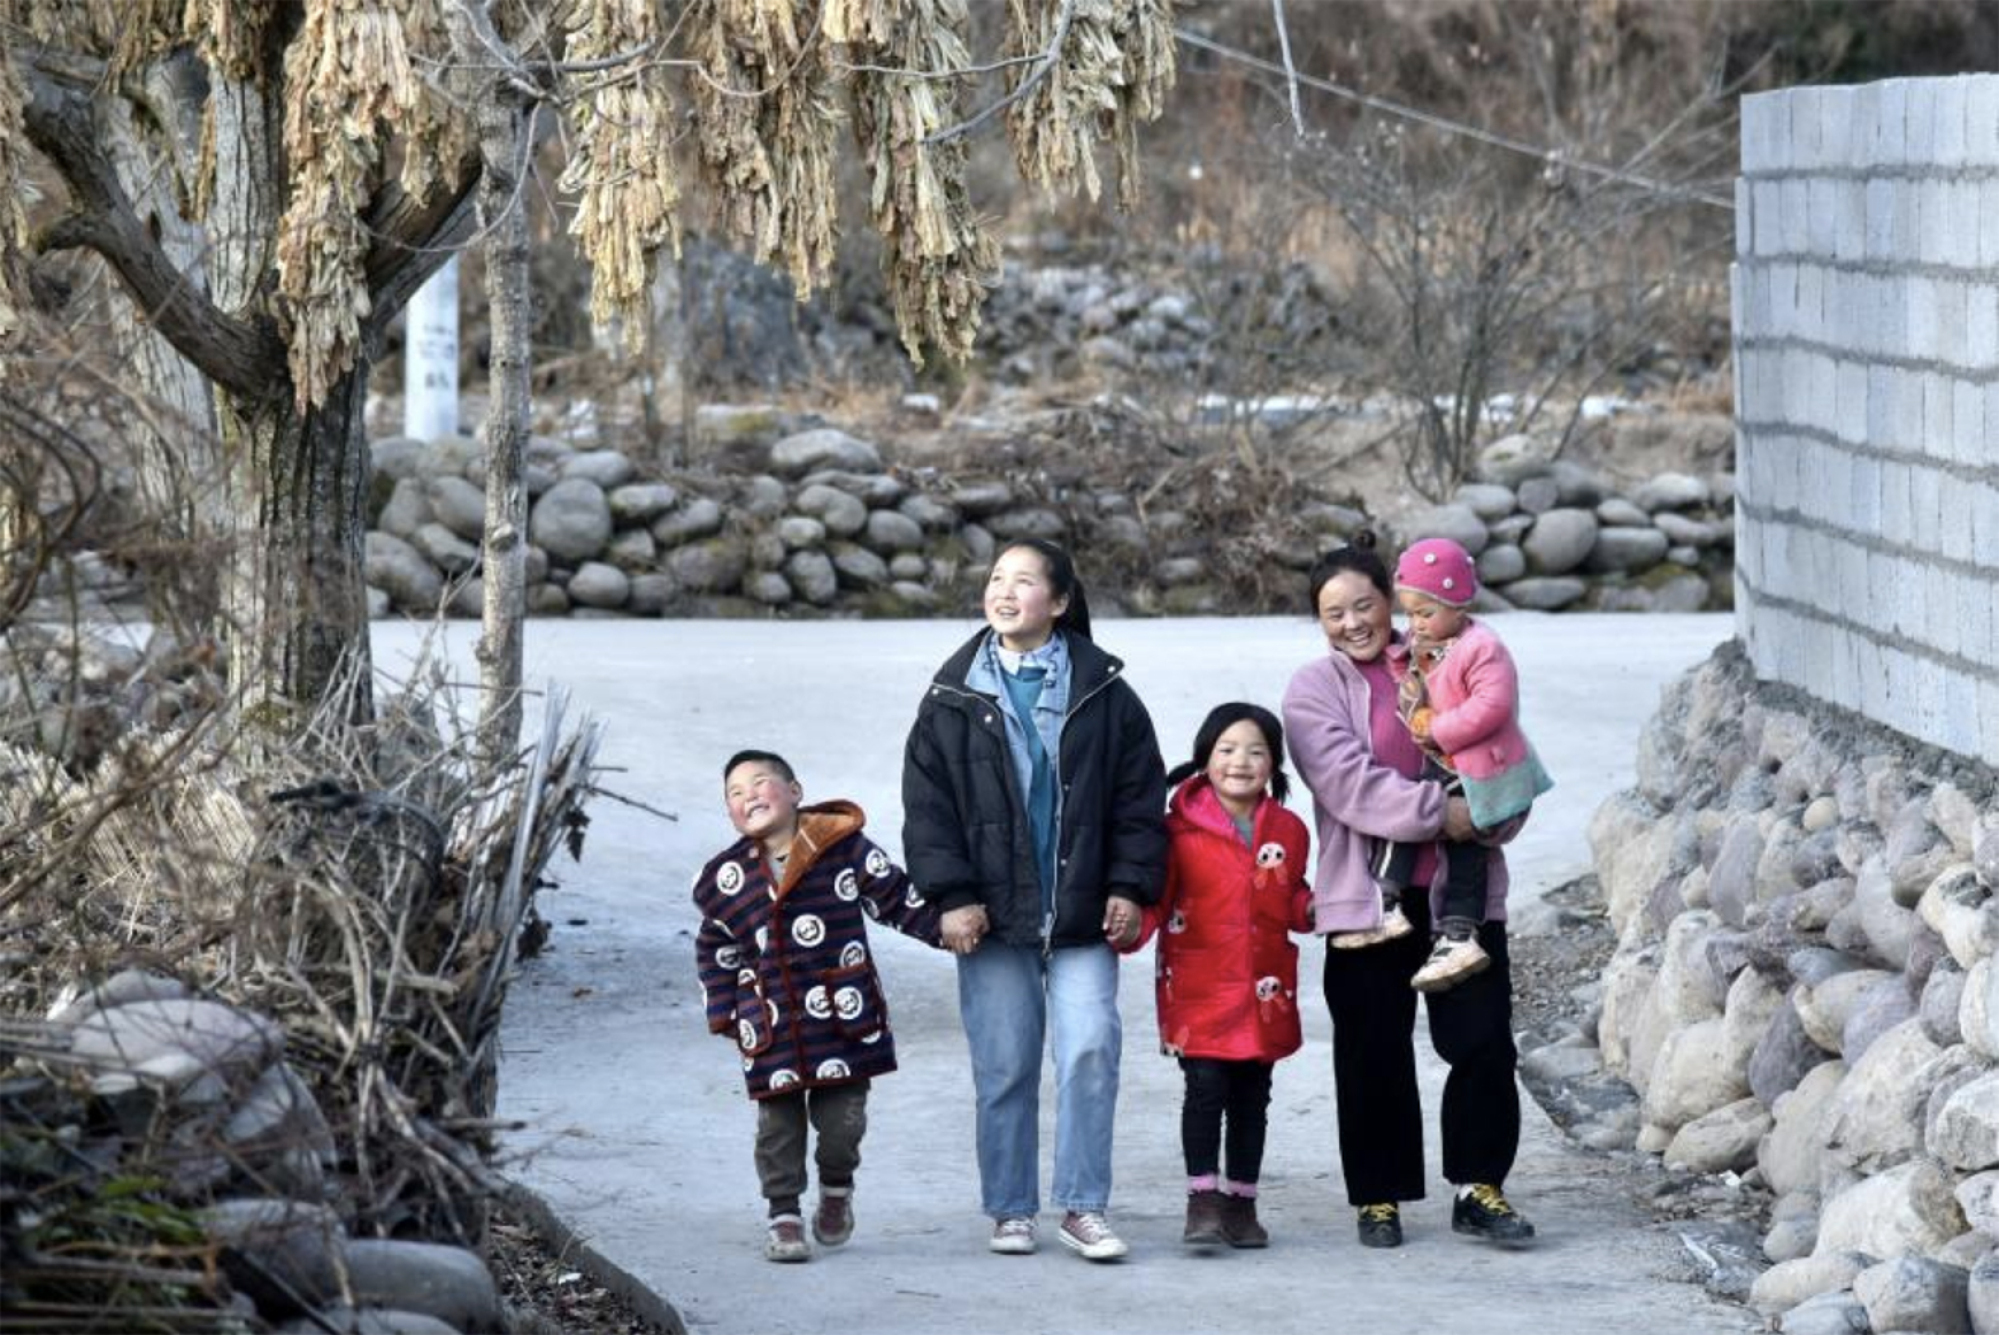 Bamu walks with her children on a newly paved concrete road in Taoyuan village. Photo: Xinhua / Zhou Ke